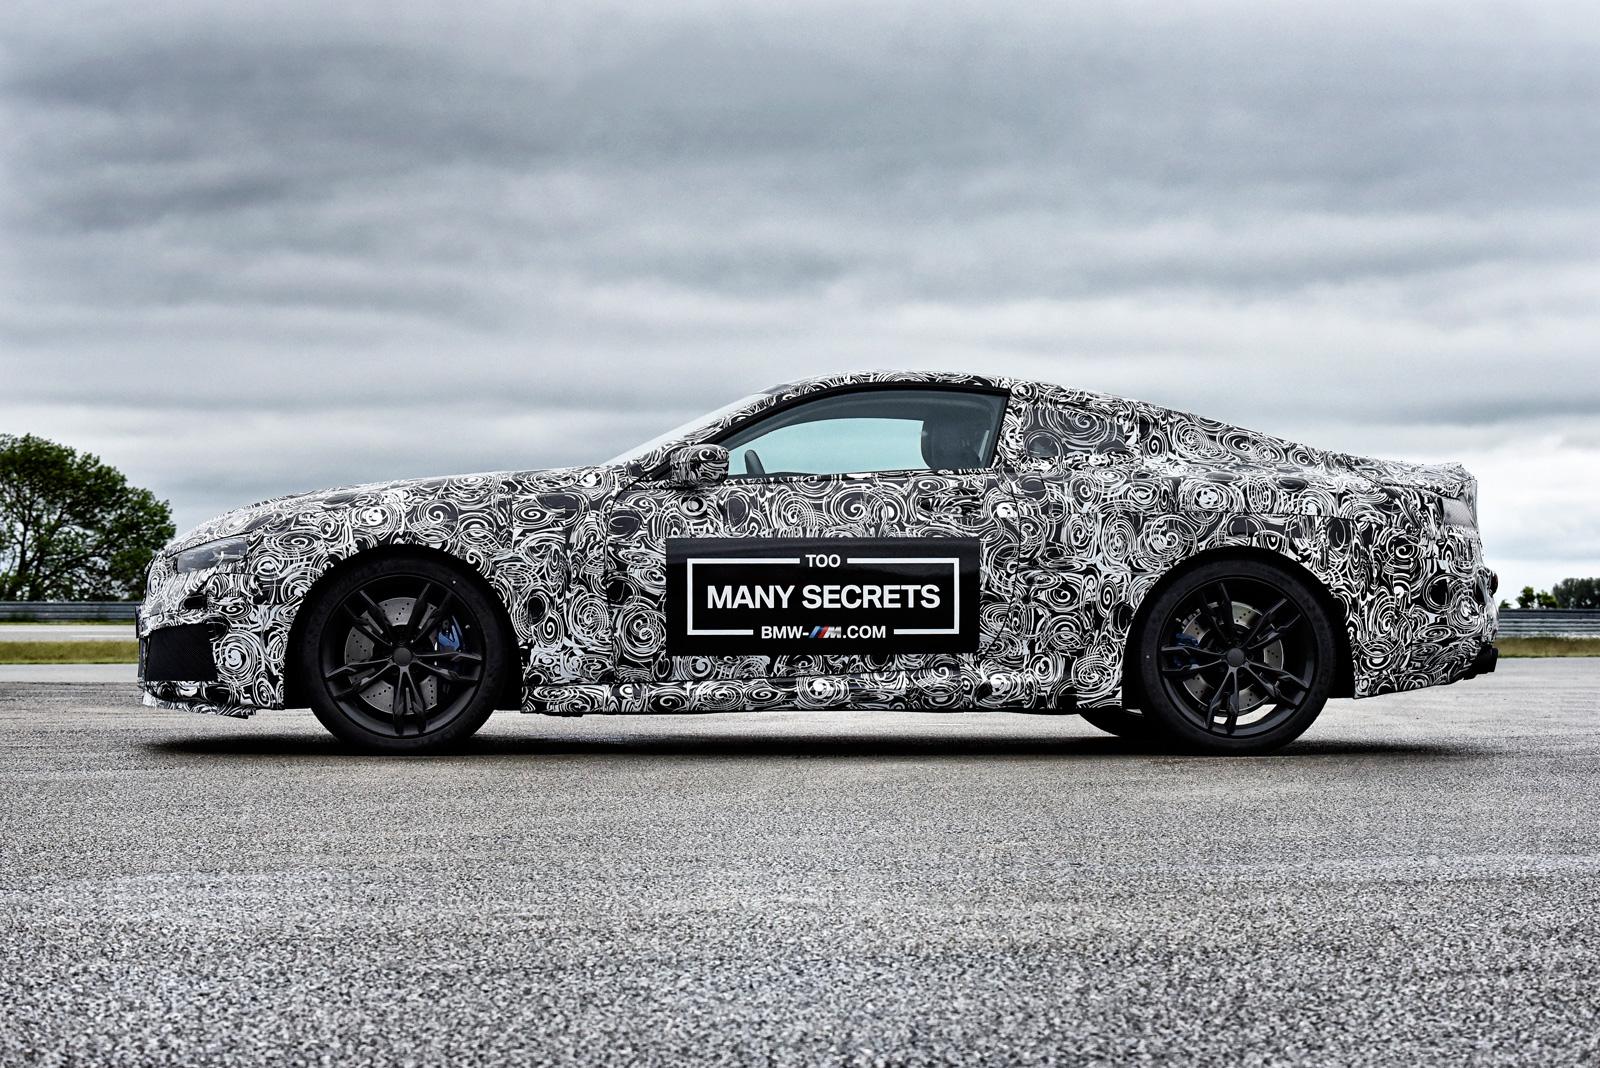 BMW Says Hybrid M Cars are Already Undergoing Testing